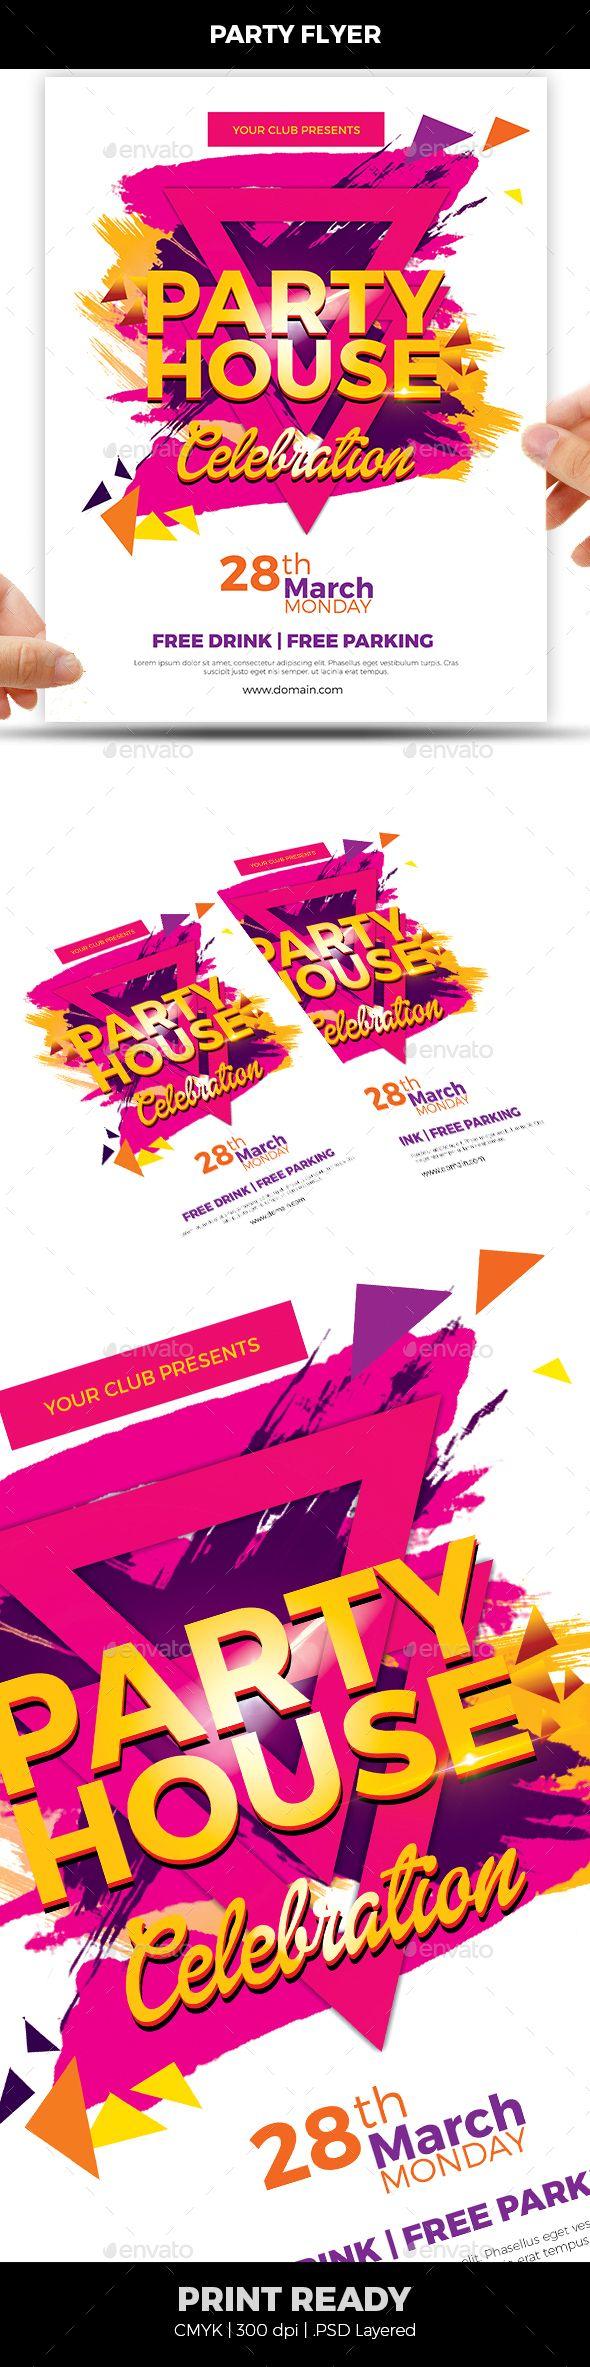 web design flyer